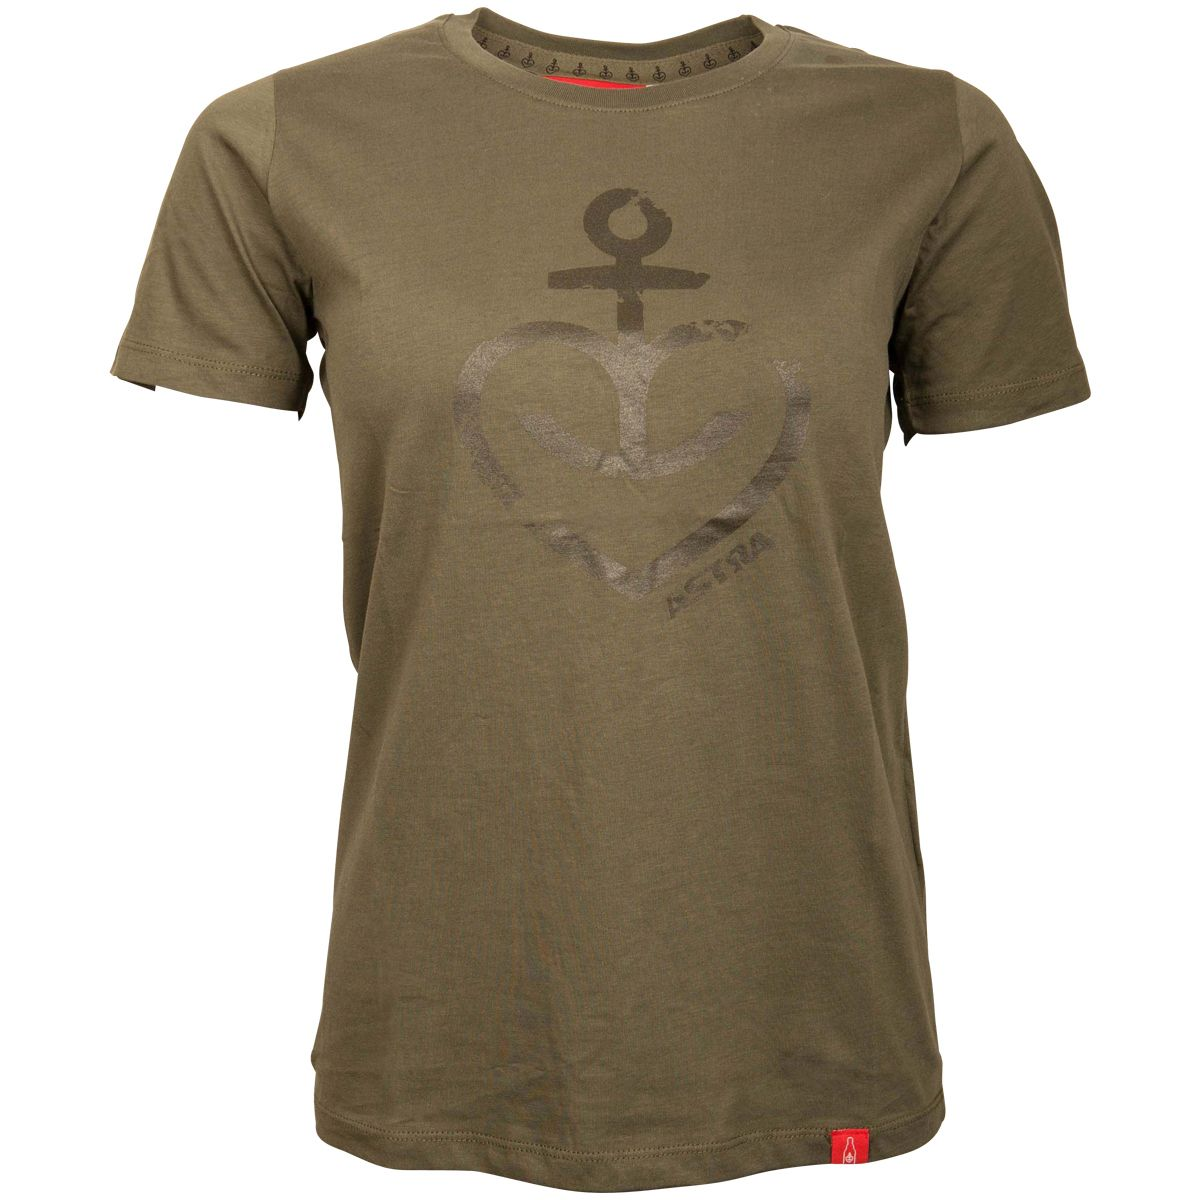 Astra - Damen T-Shirt Herzanker - oliv